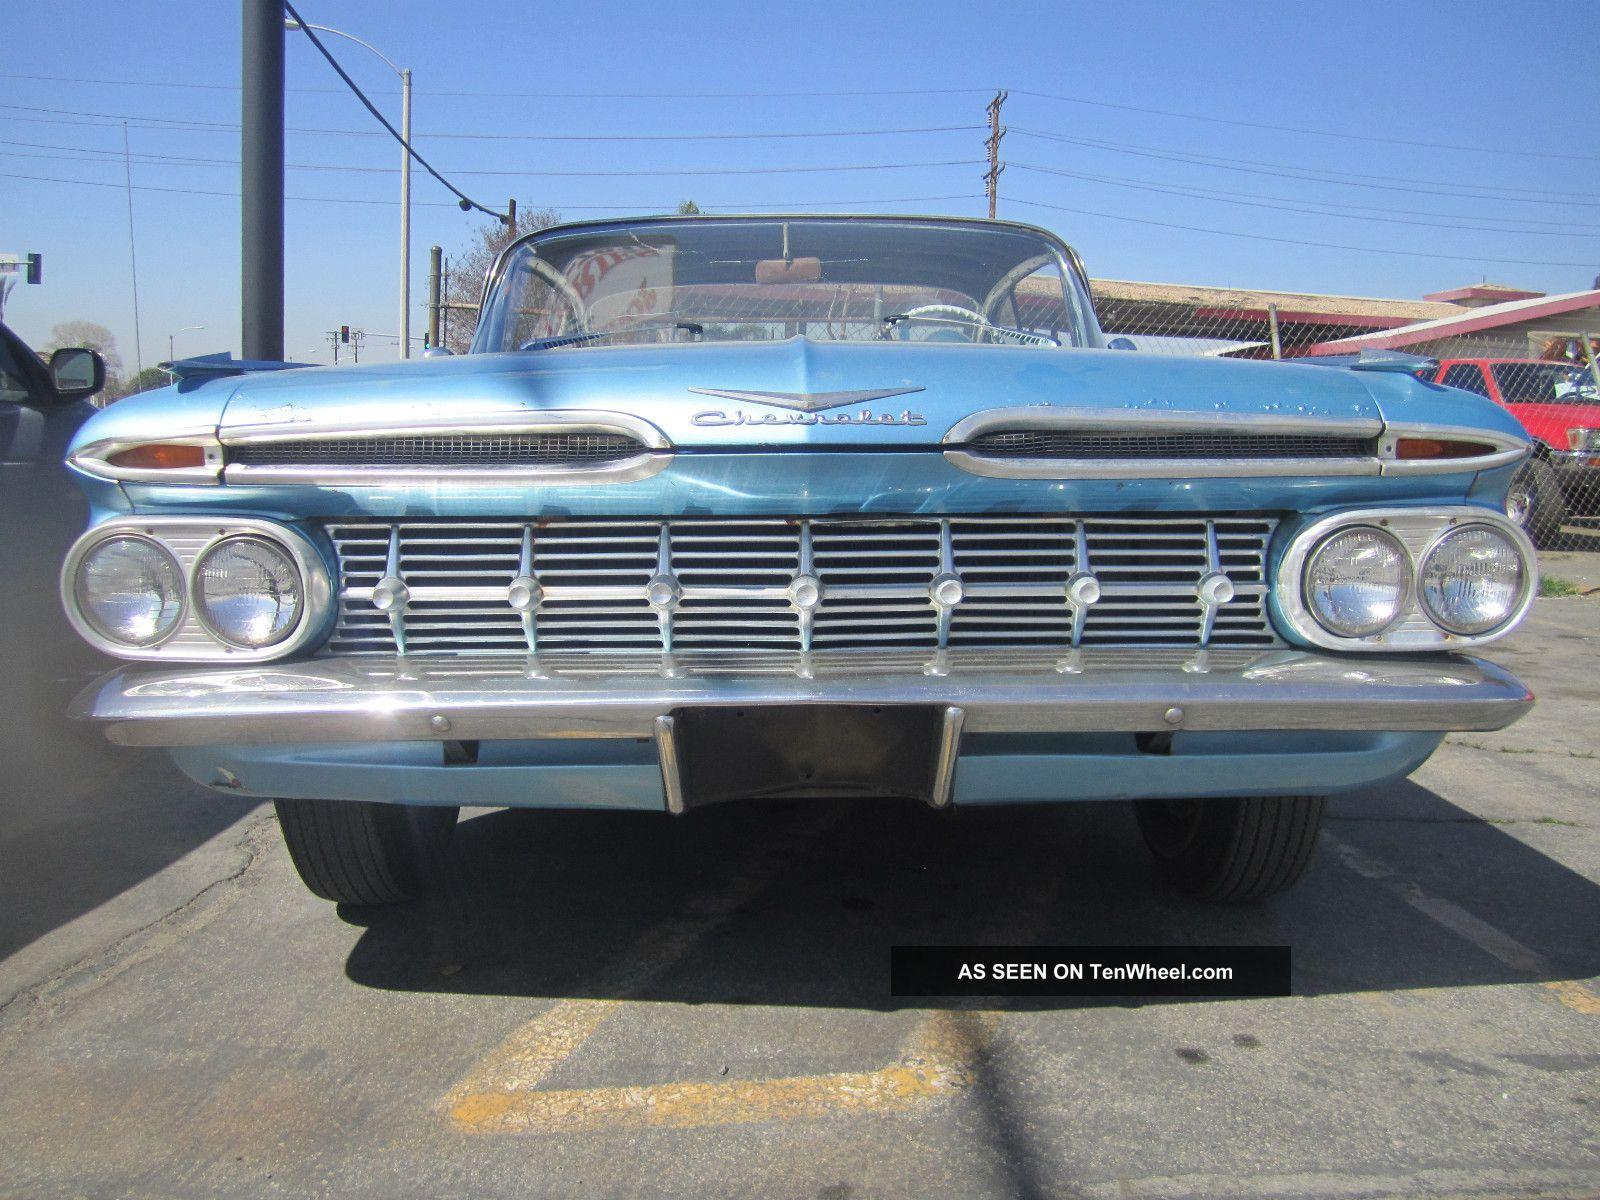 1959 Impala 4 Door Hardtop | DiyMid.com